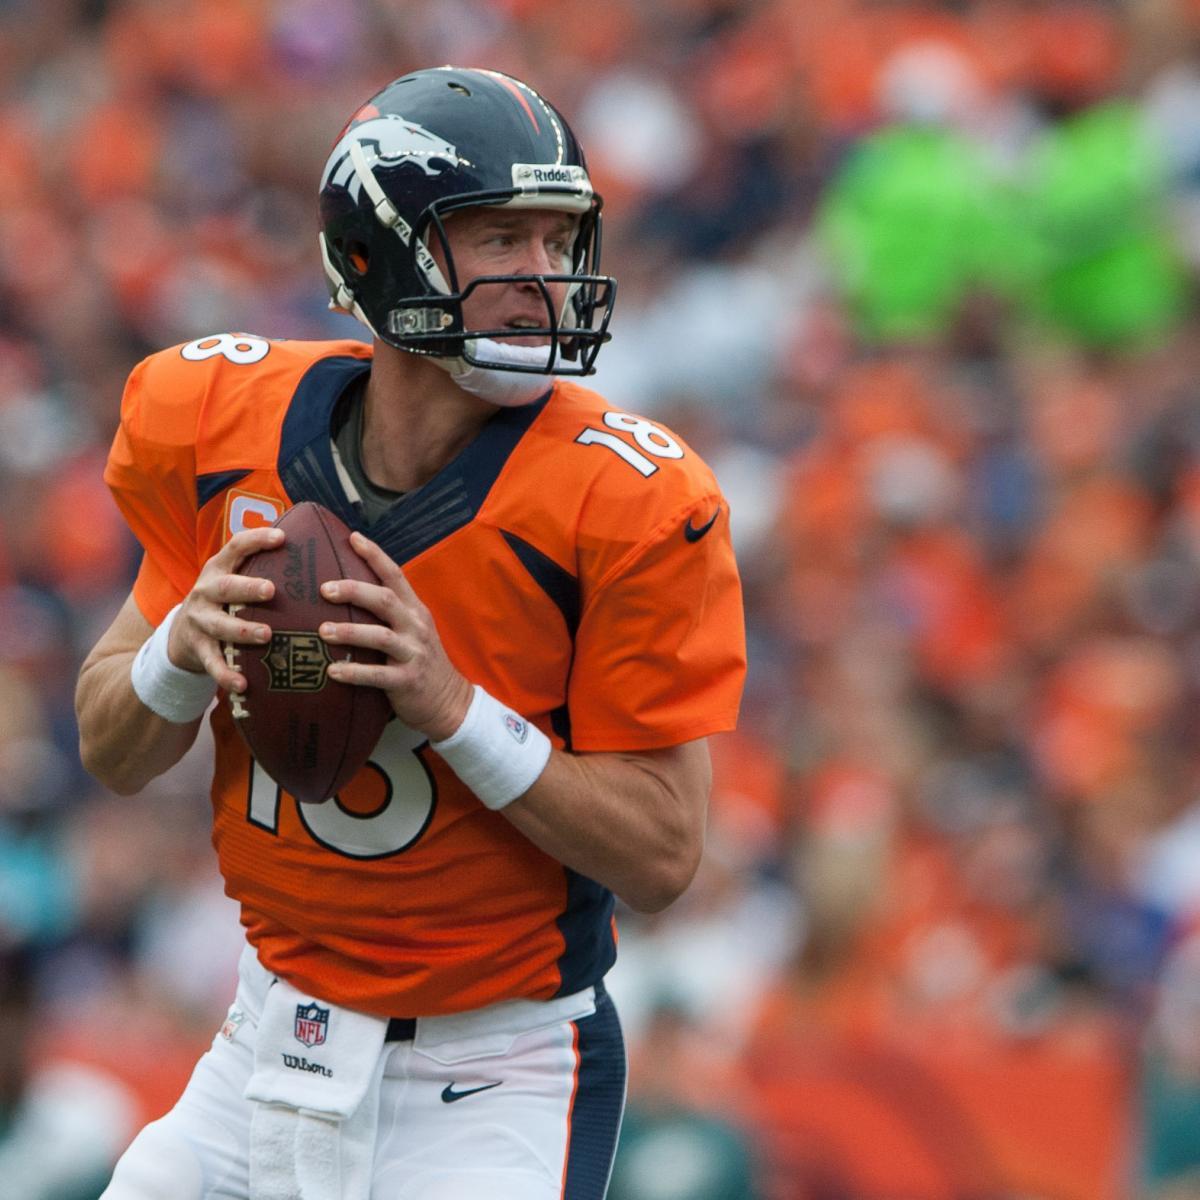 Denver News Road Conditions: Washington Redskins Vs. Denver Broncos: Breaking Down